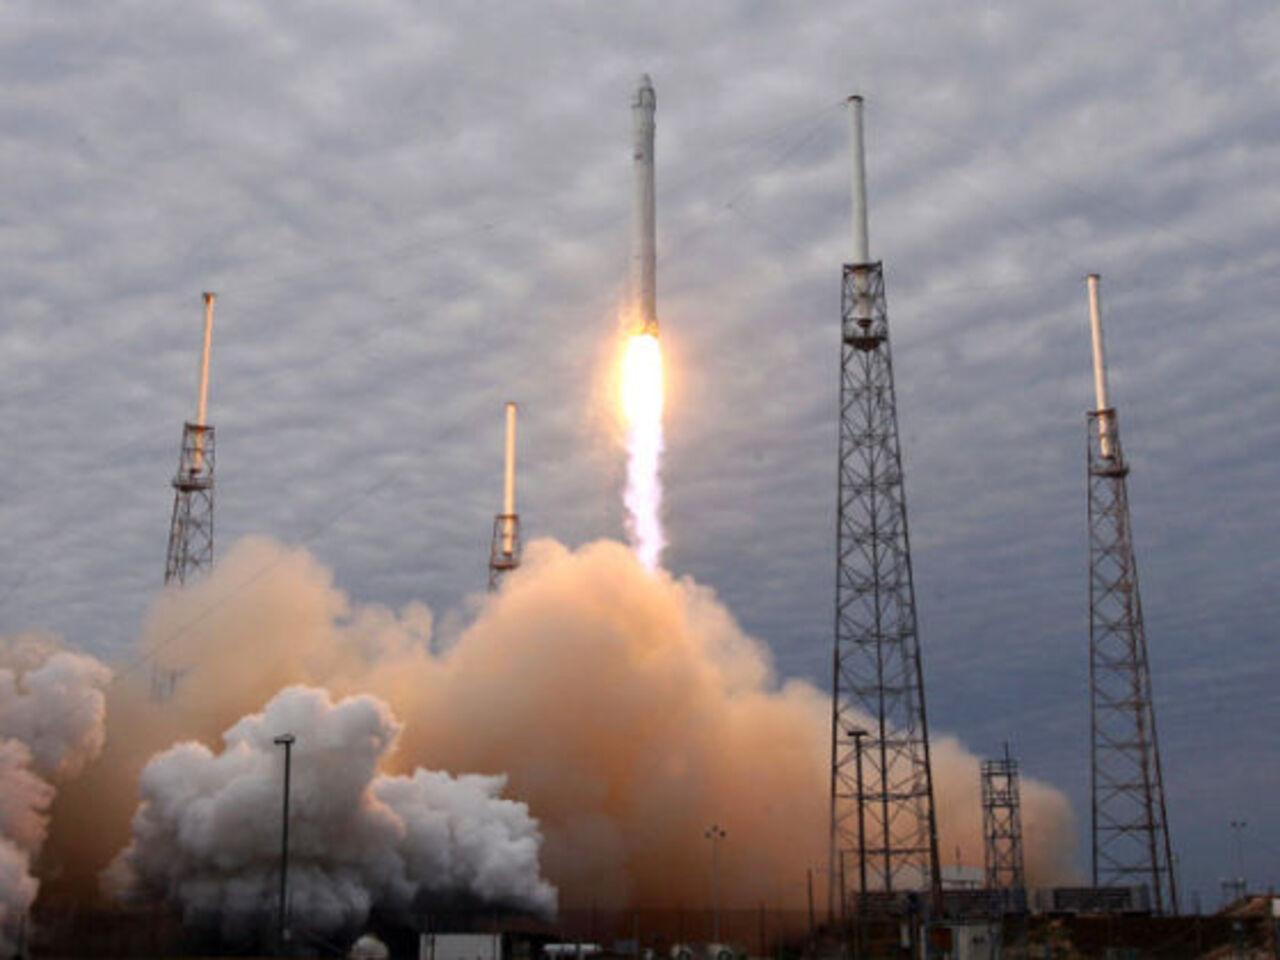 США испытали межконтинентальную баллистическую ракету Minuteman III